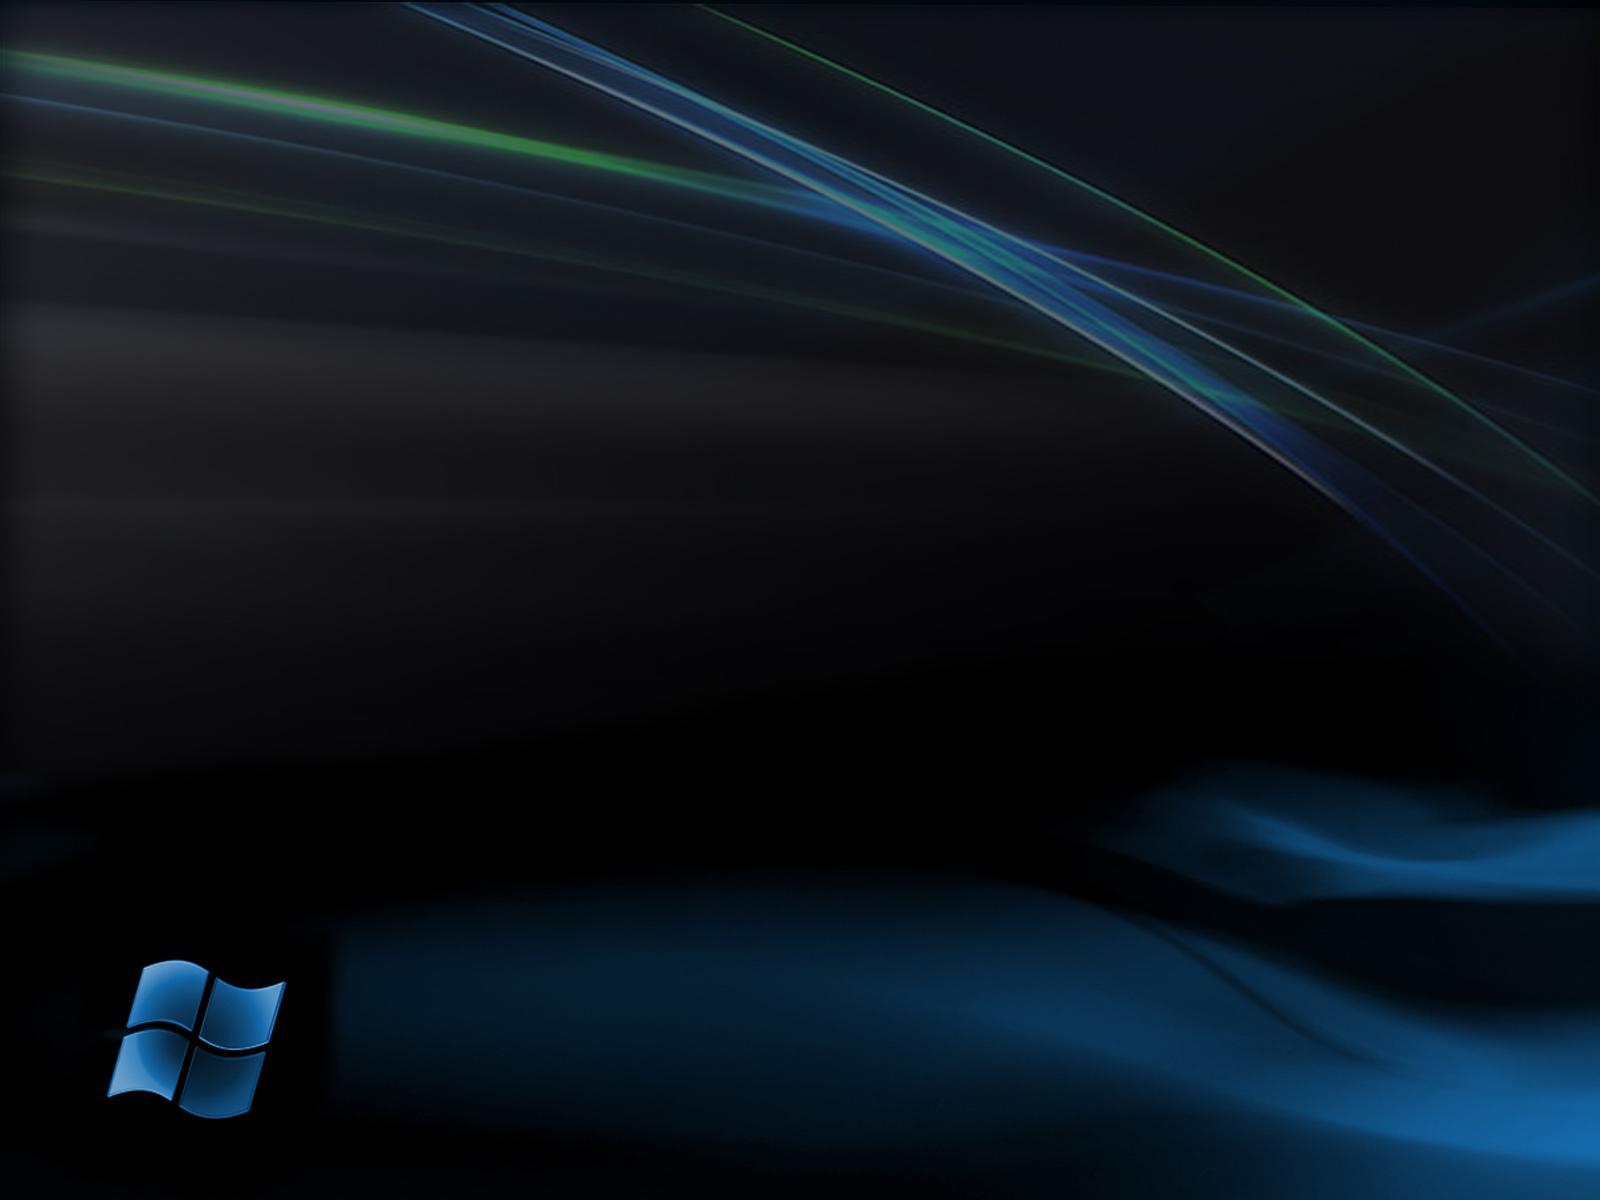 http://4.bp.blogspot.com/-WDhSxQz3CzQ/T8ew001AoAI/AAAAAAAAAIs/NNG9juAdfxU/s1600/windows-7-wallpaper-16.jpg